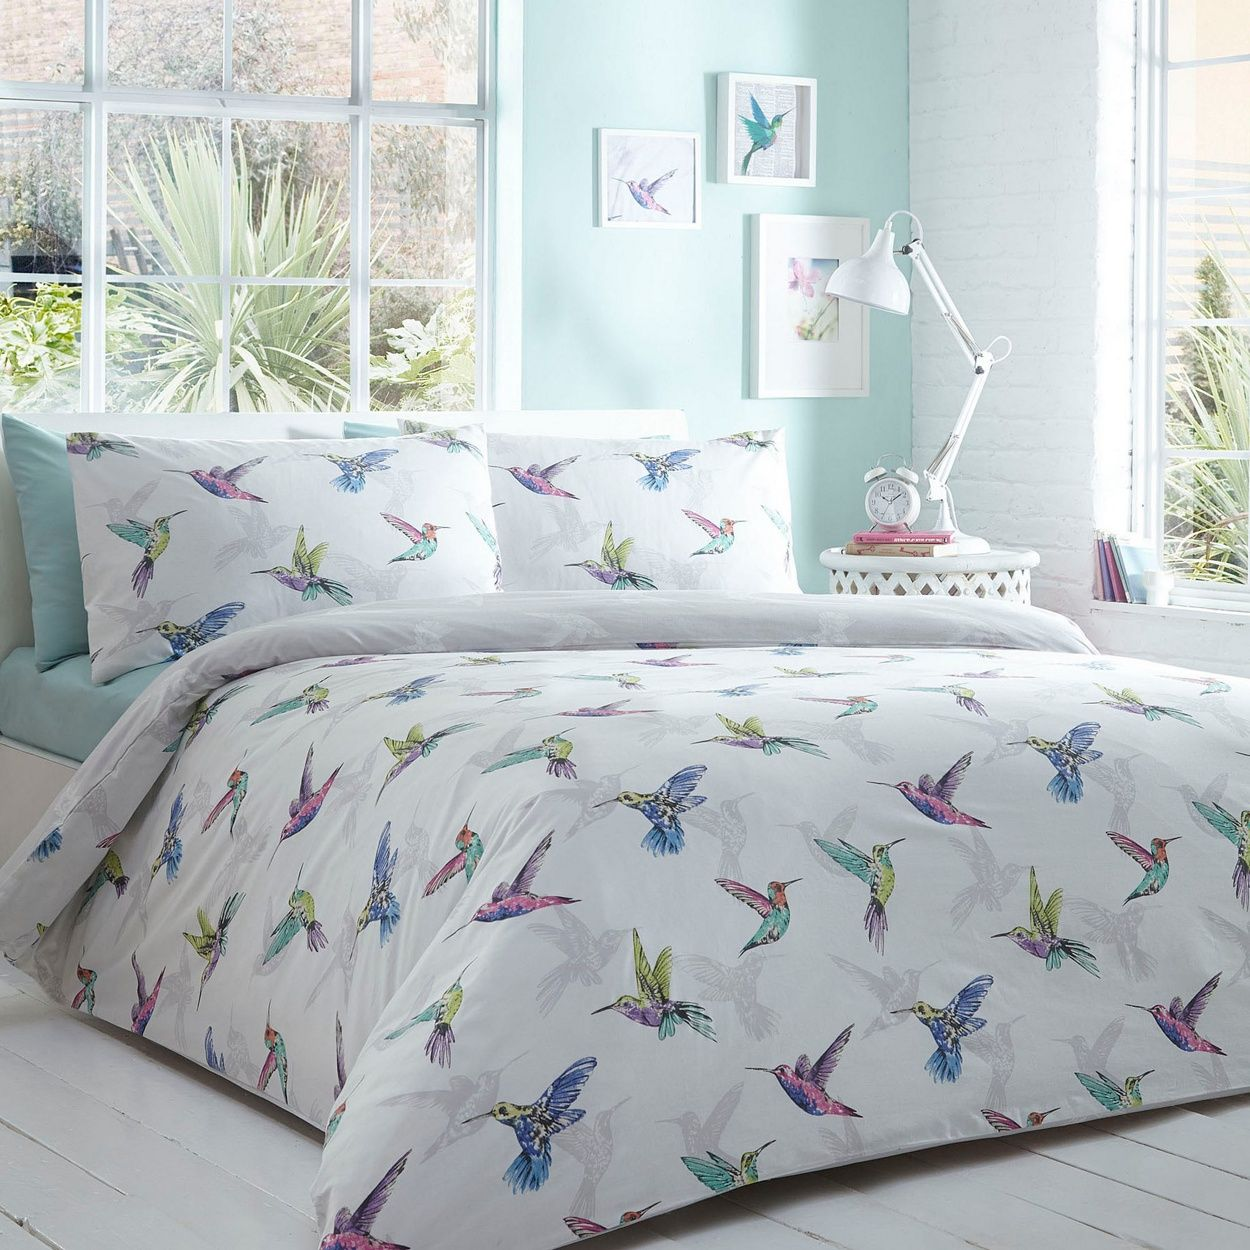 Home Collection Basics 'Hummingbird' bedding set